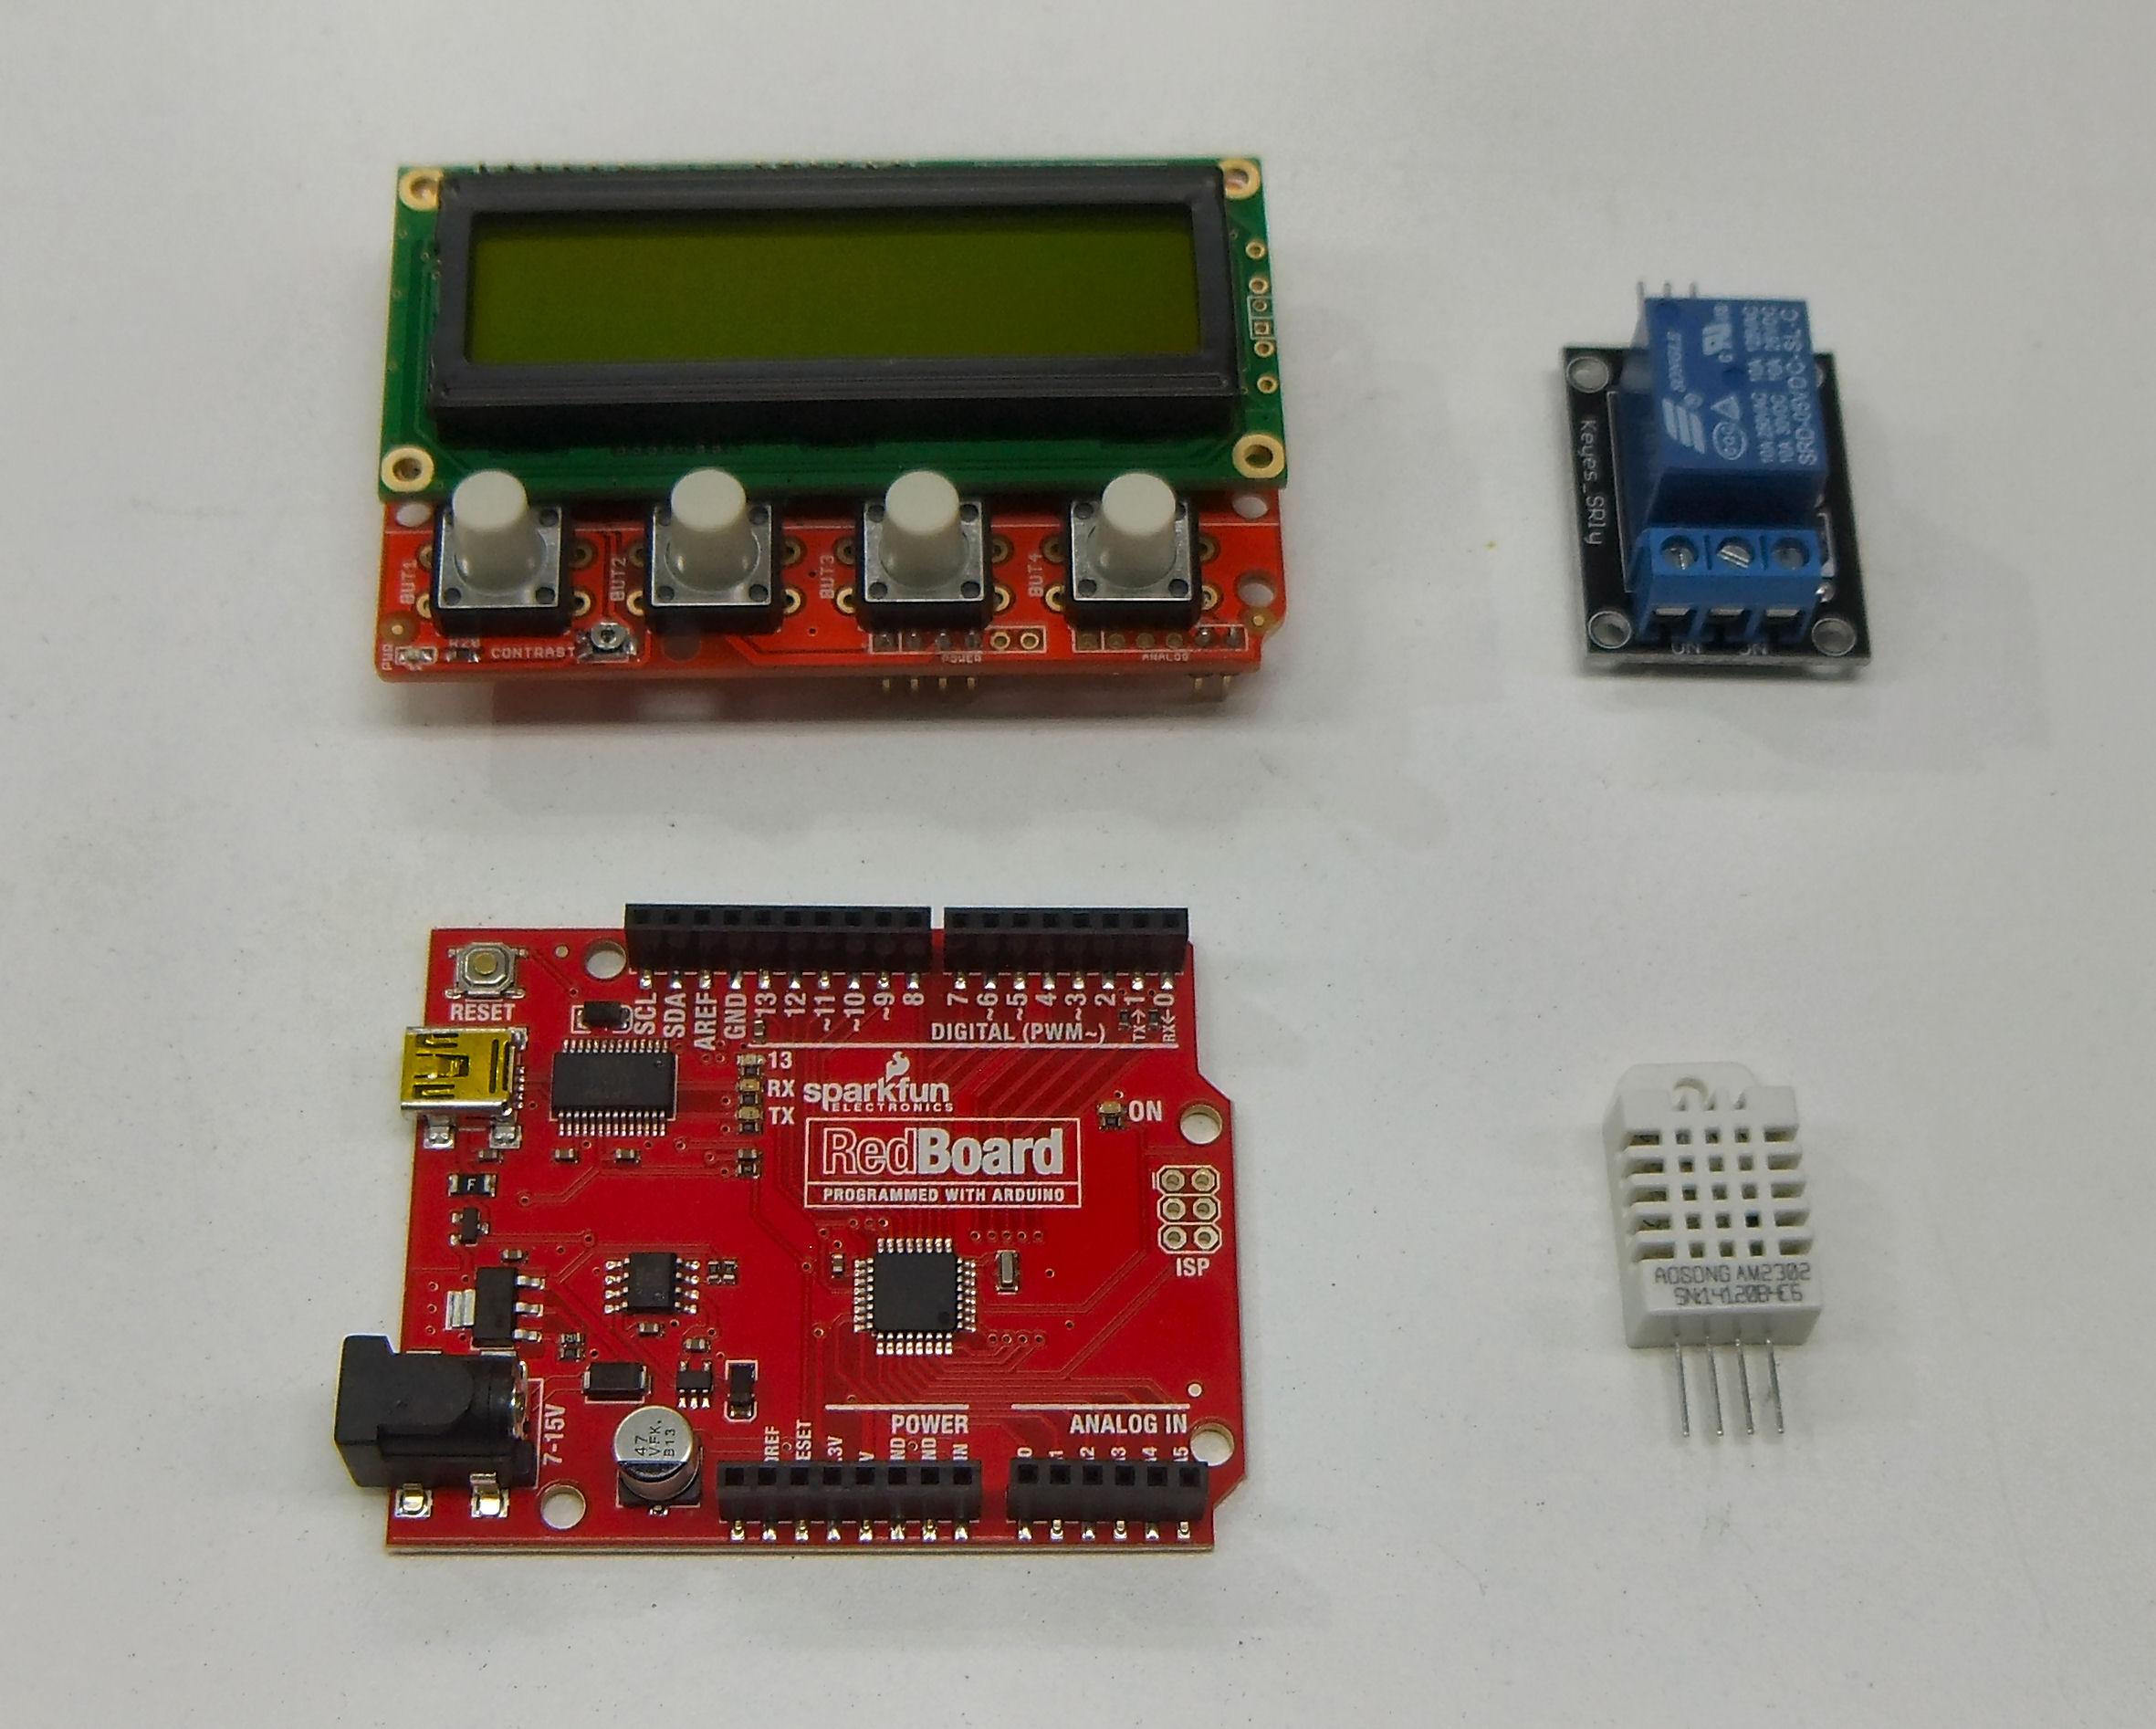 Build a Dual Thermostat for Precise Preset Temperatures | Make